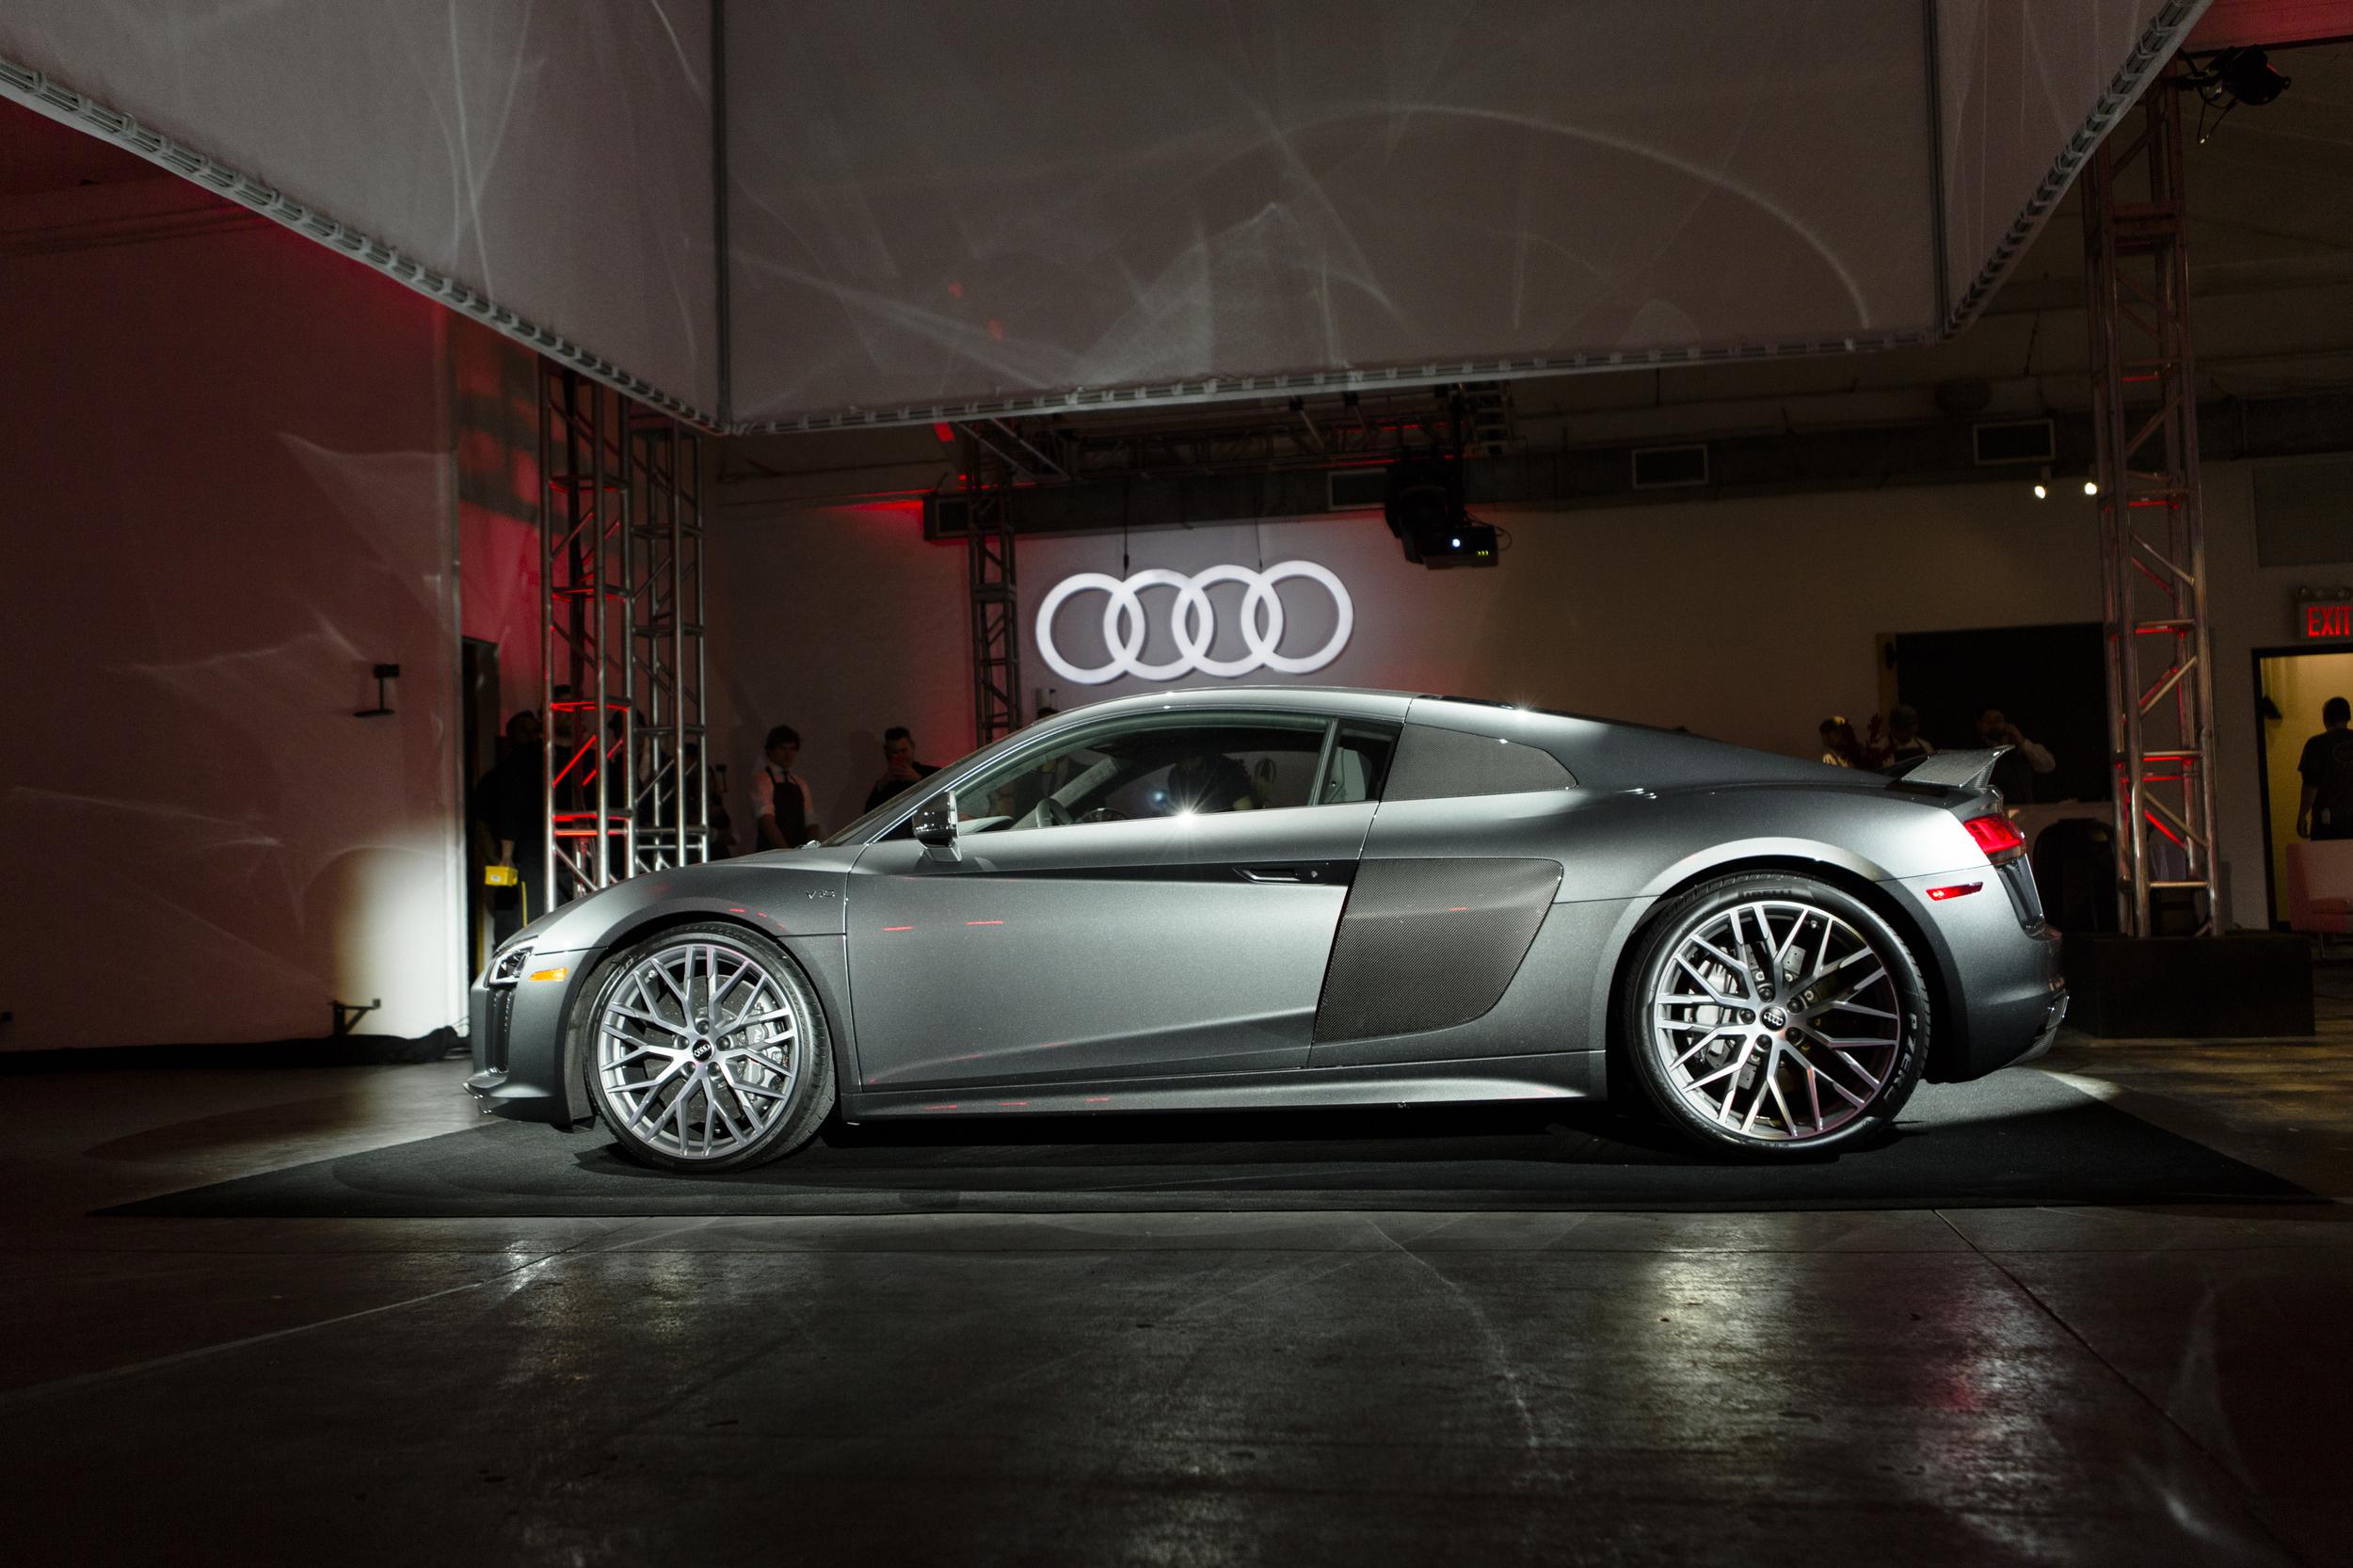 Audi-HD-45_B6A9100.jpg